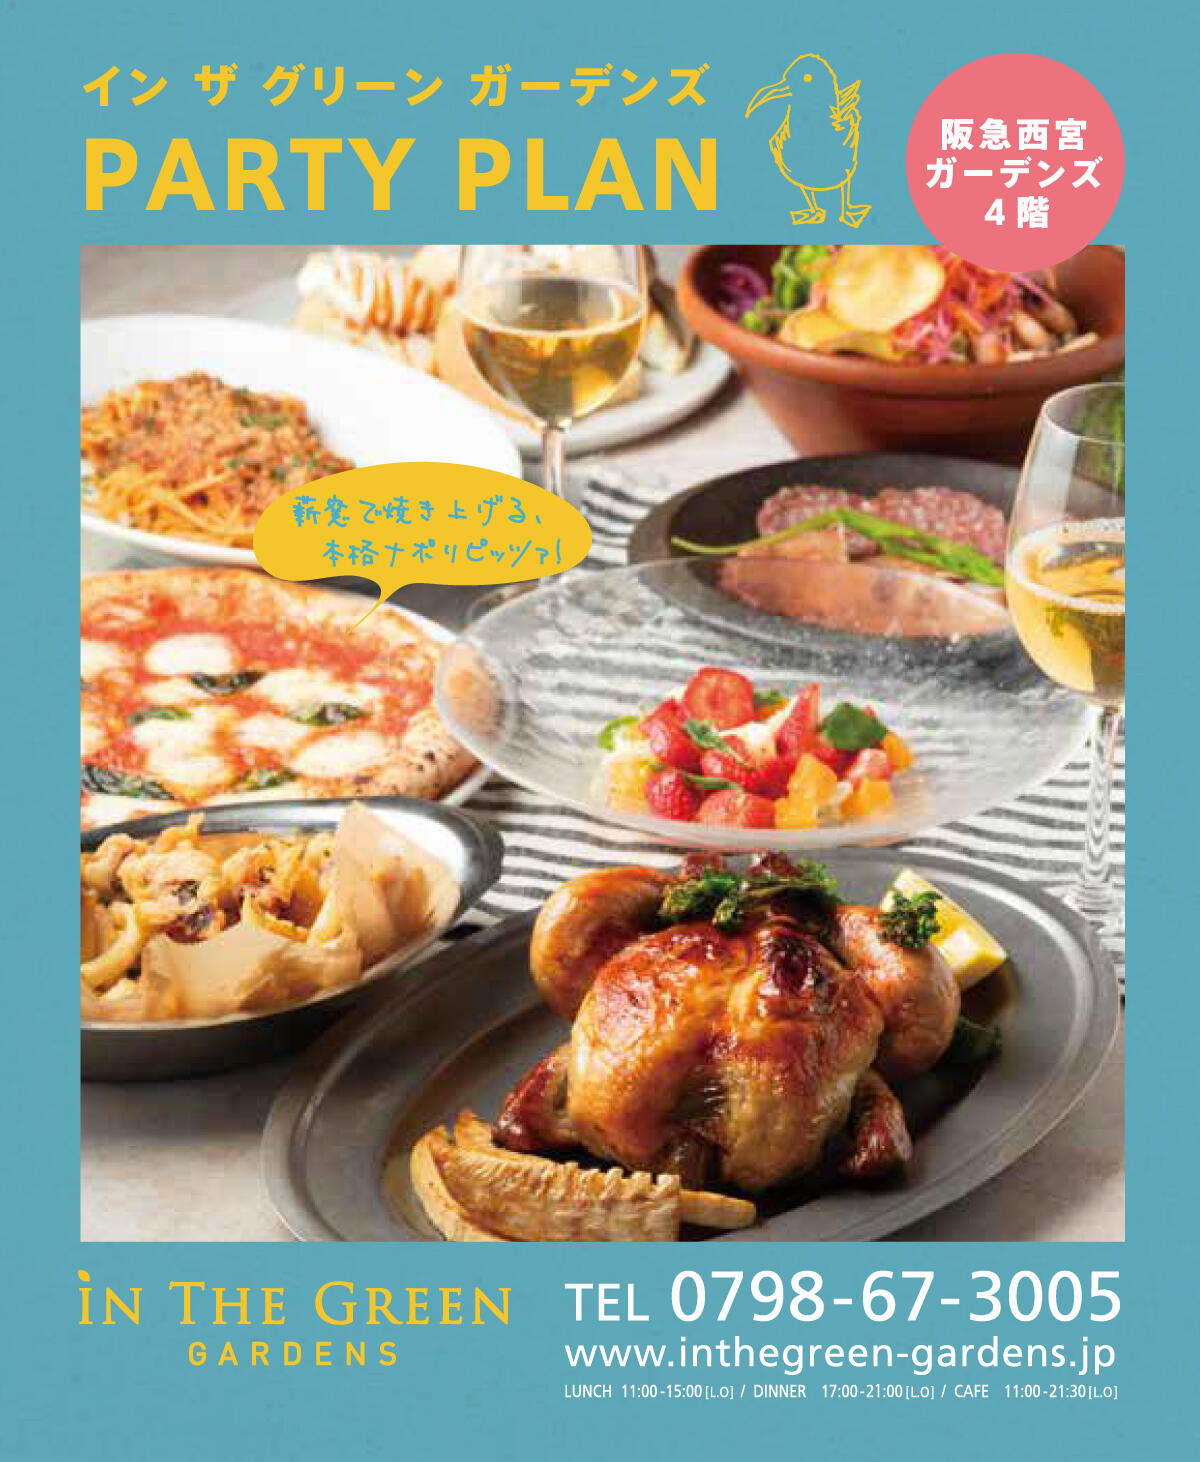 itgg_partyplan1.jpg